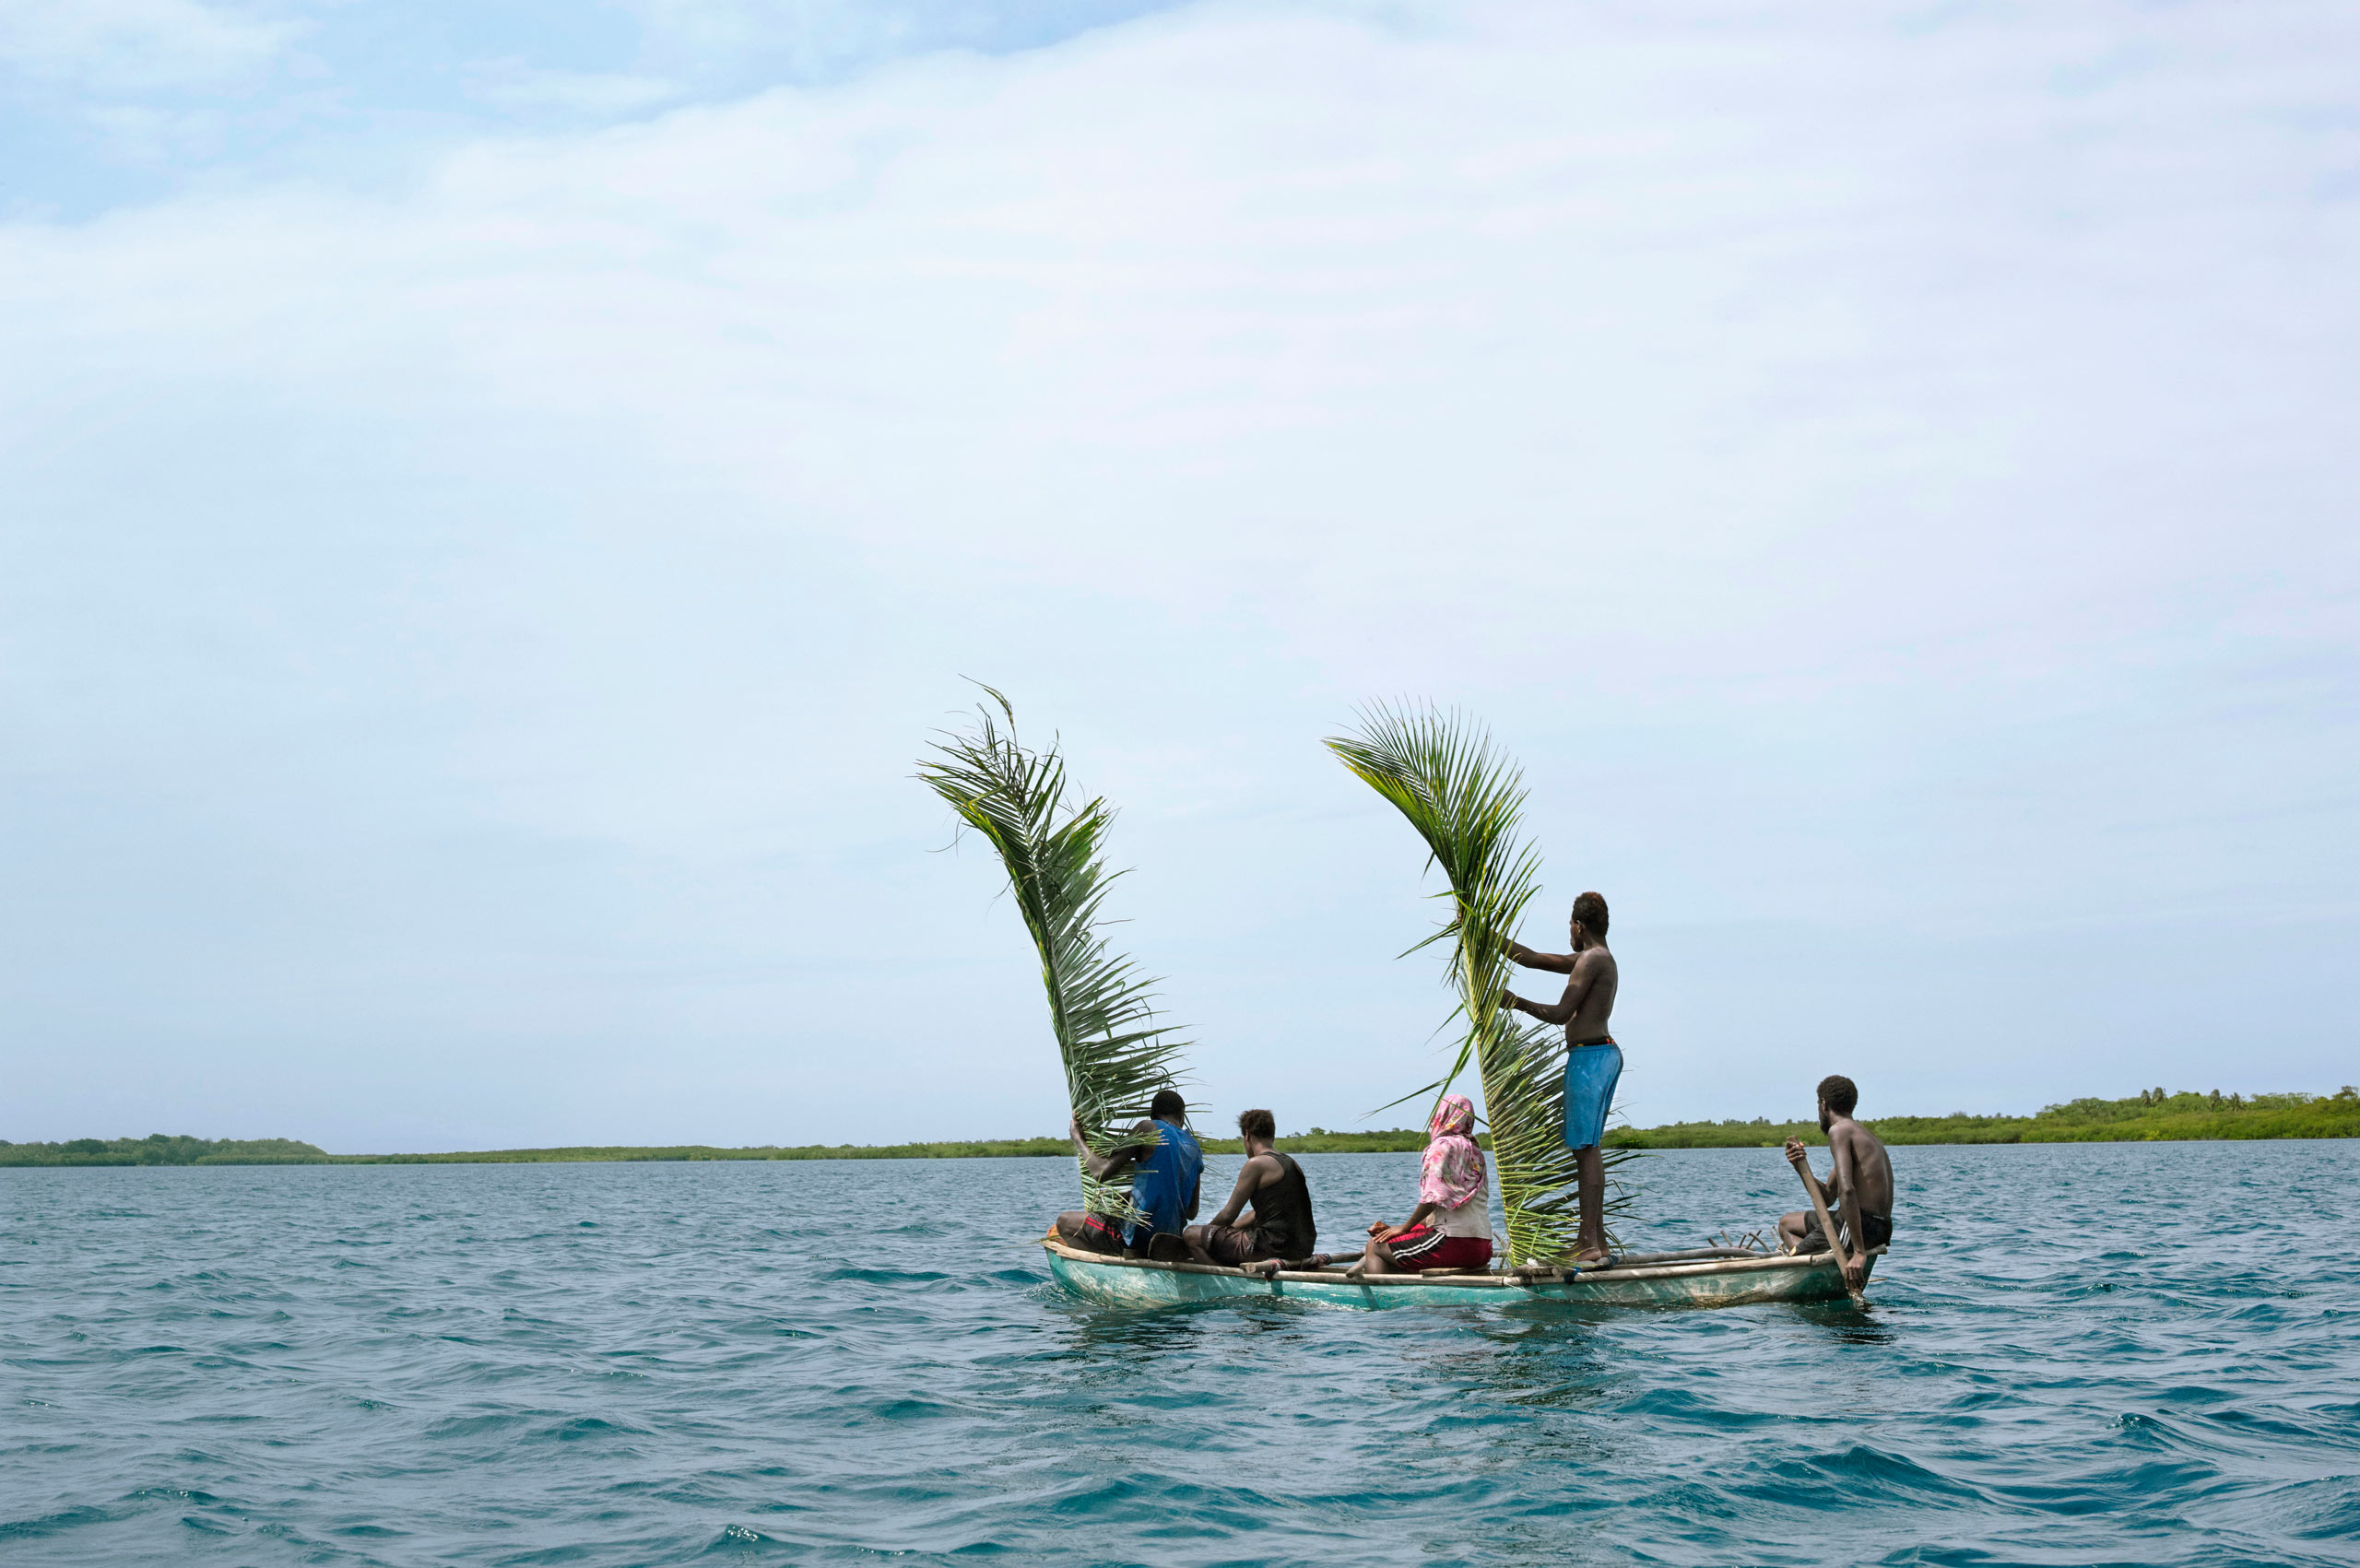 Off the shore of Malekula. Vanuatu, 2014.